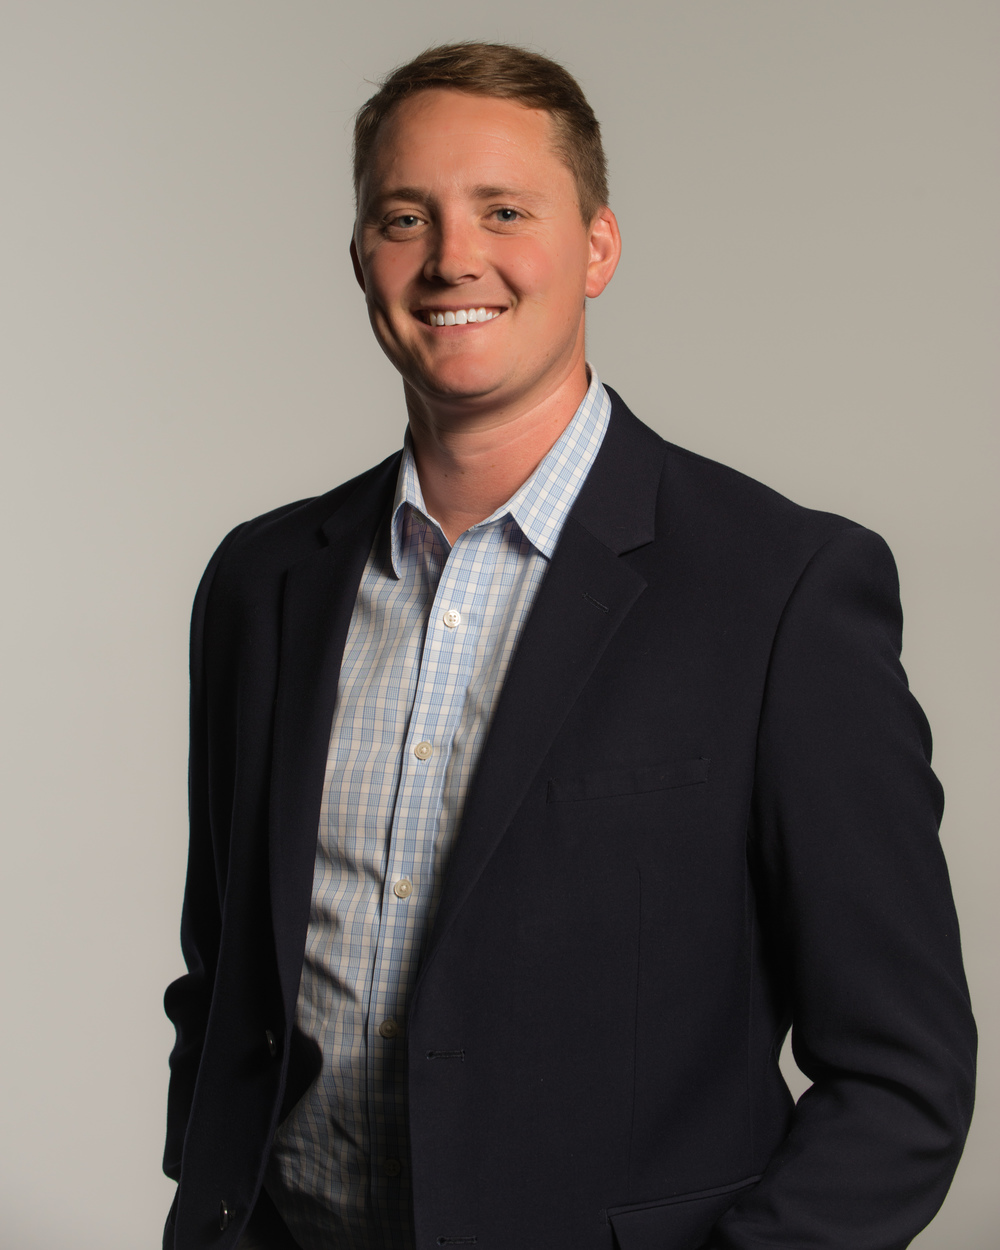 Blake Hogan - Director of Partnerships